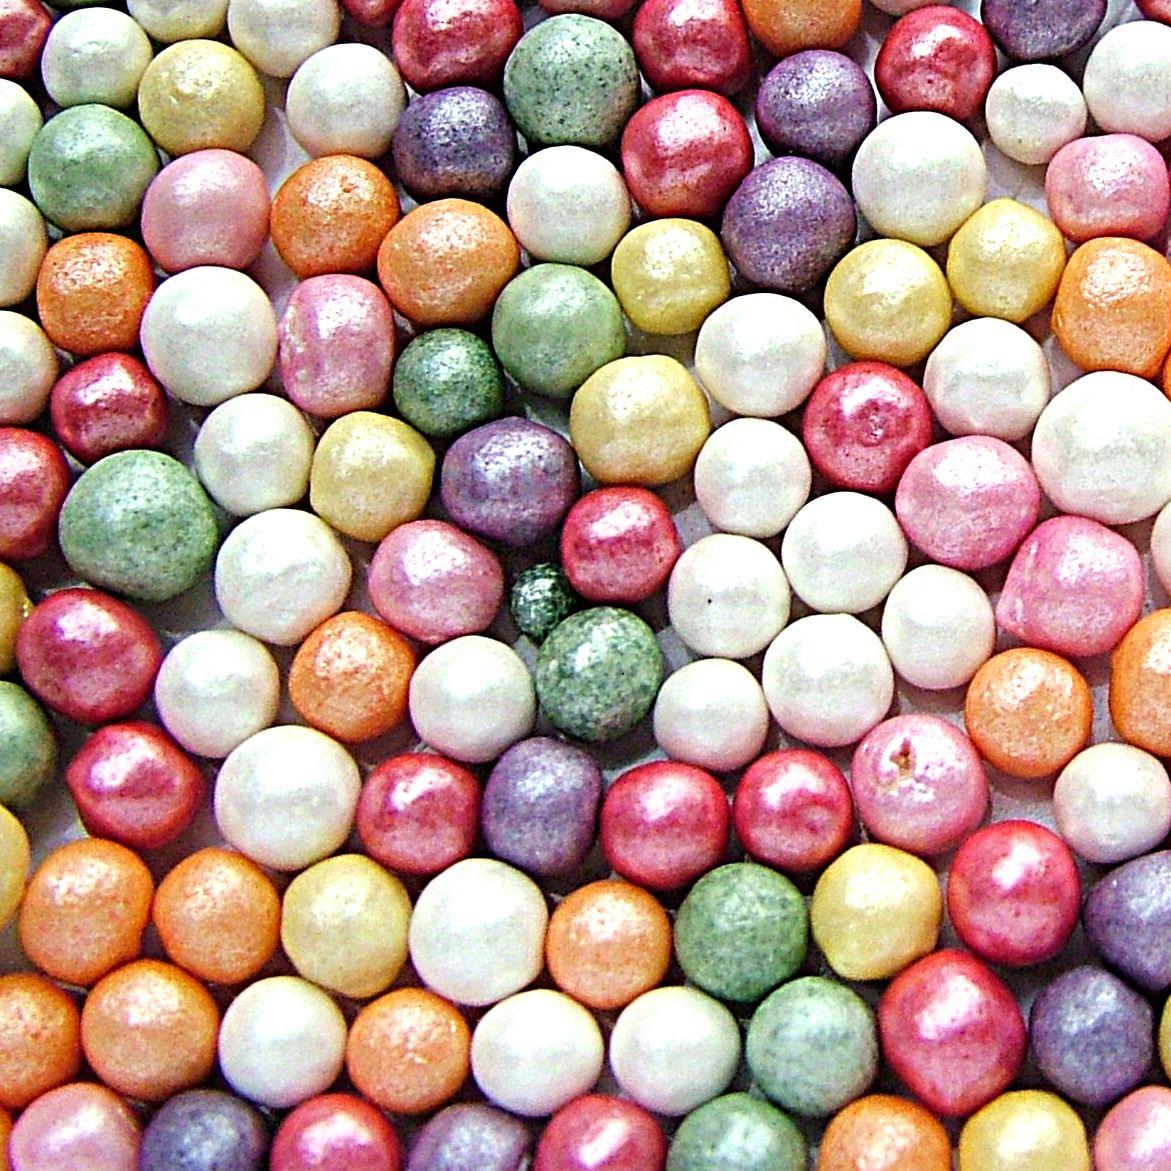 Edible Cake Decorations Pearls : Edible Cupcake Cake Sprinkles Sugar Pearls and Decorations ...